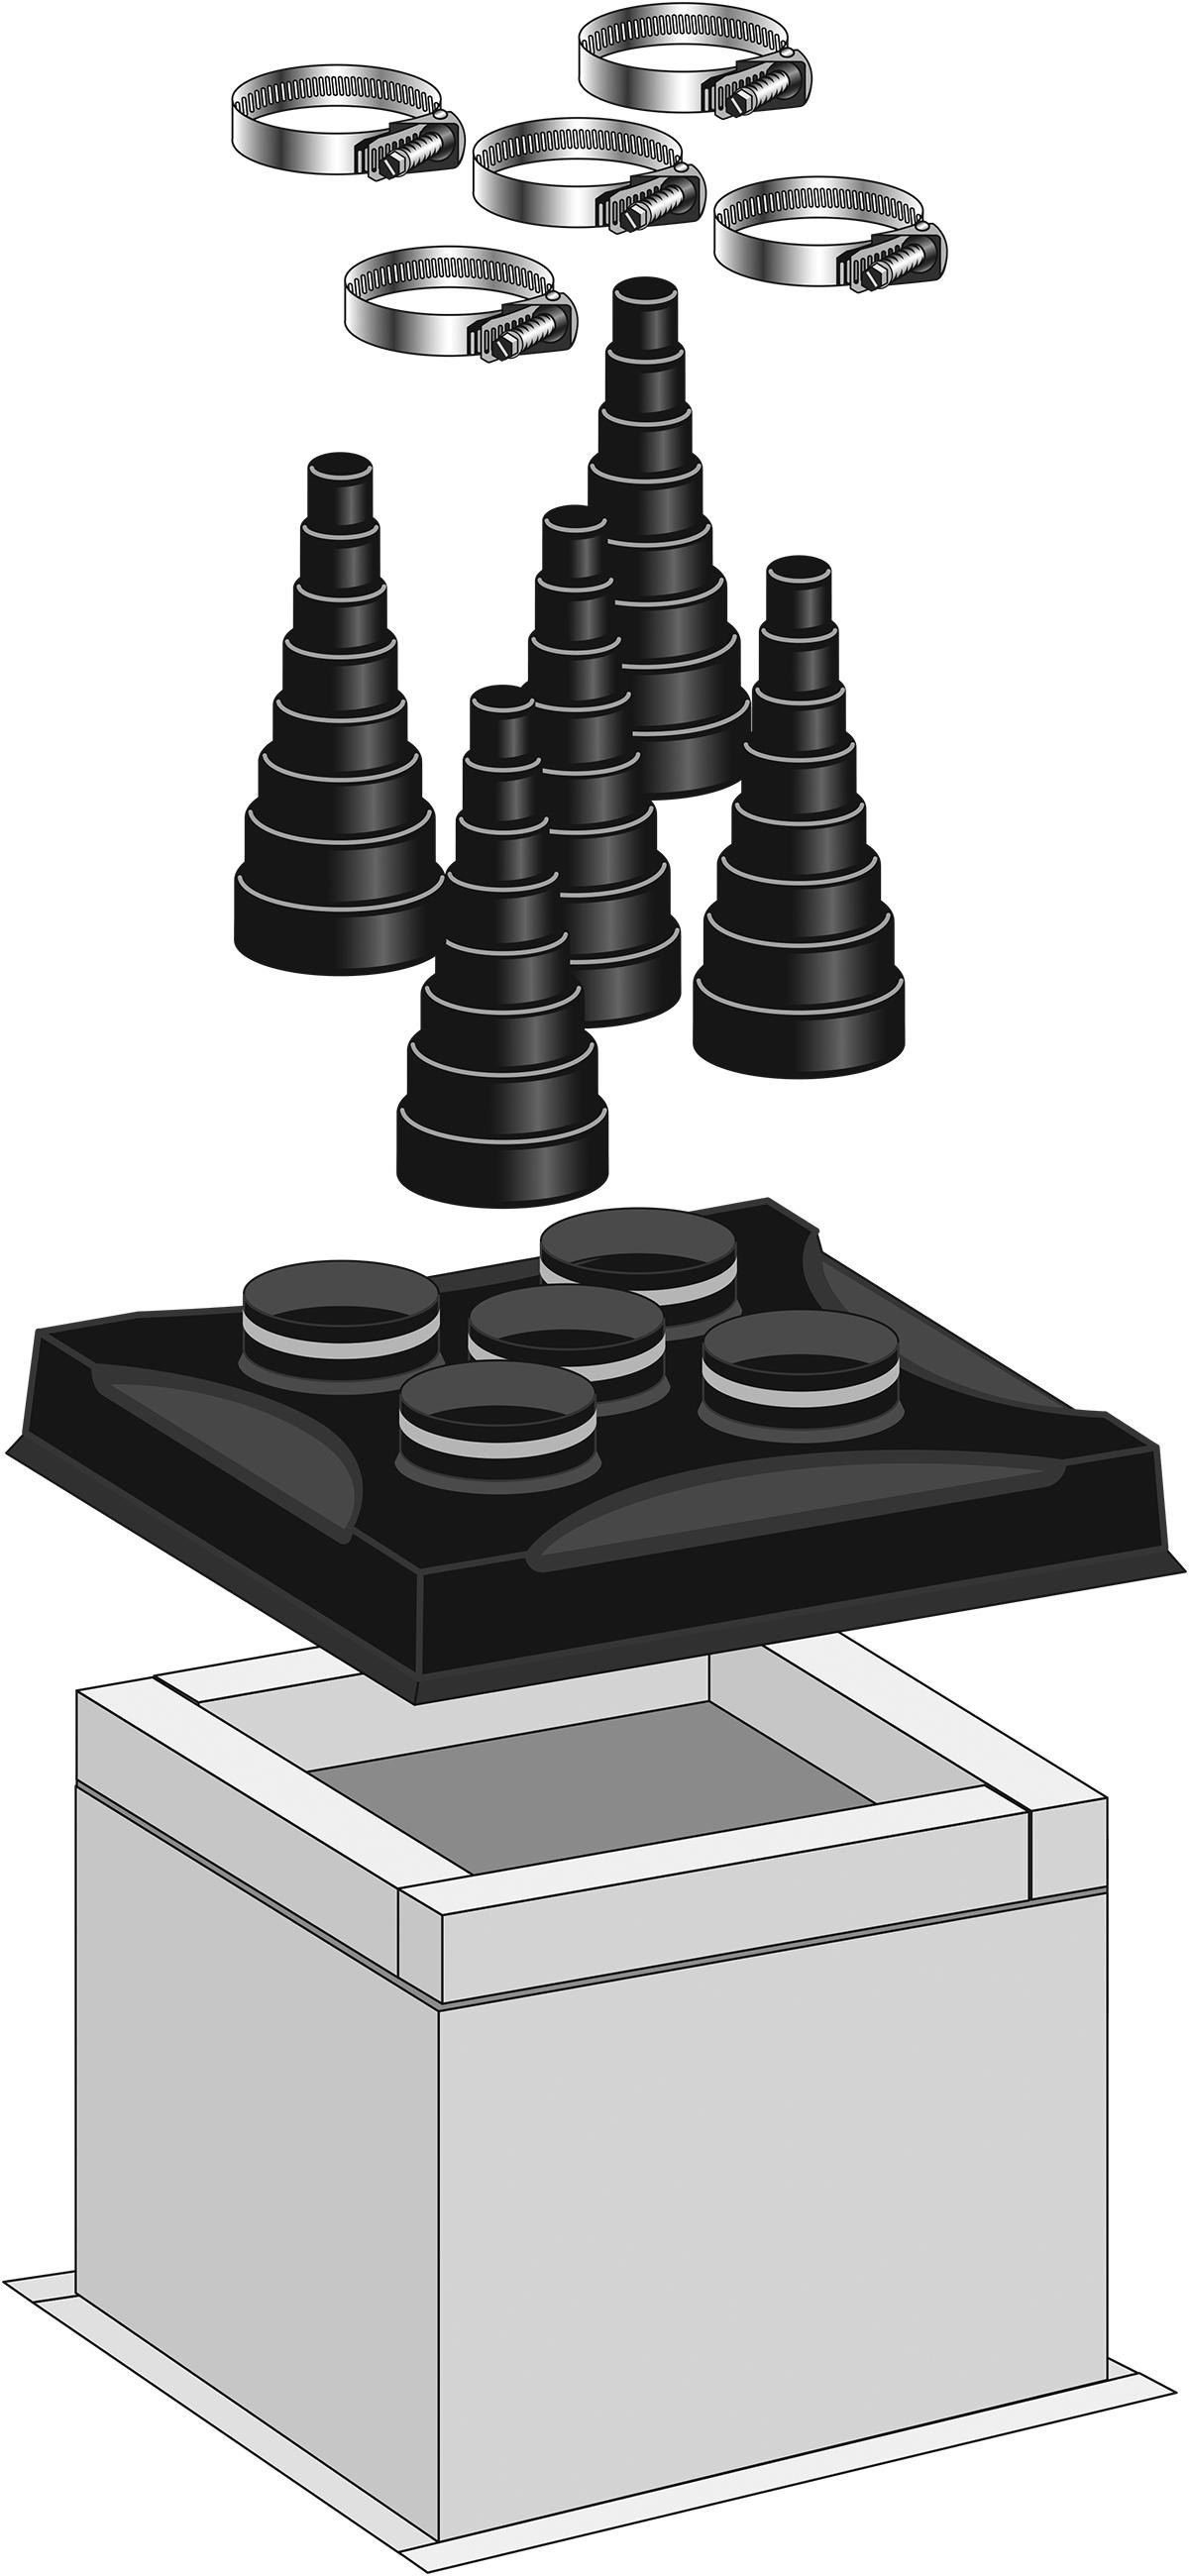 5 Hole Pipe Portal Flashing System Portalsplus